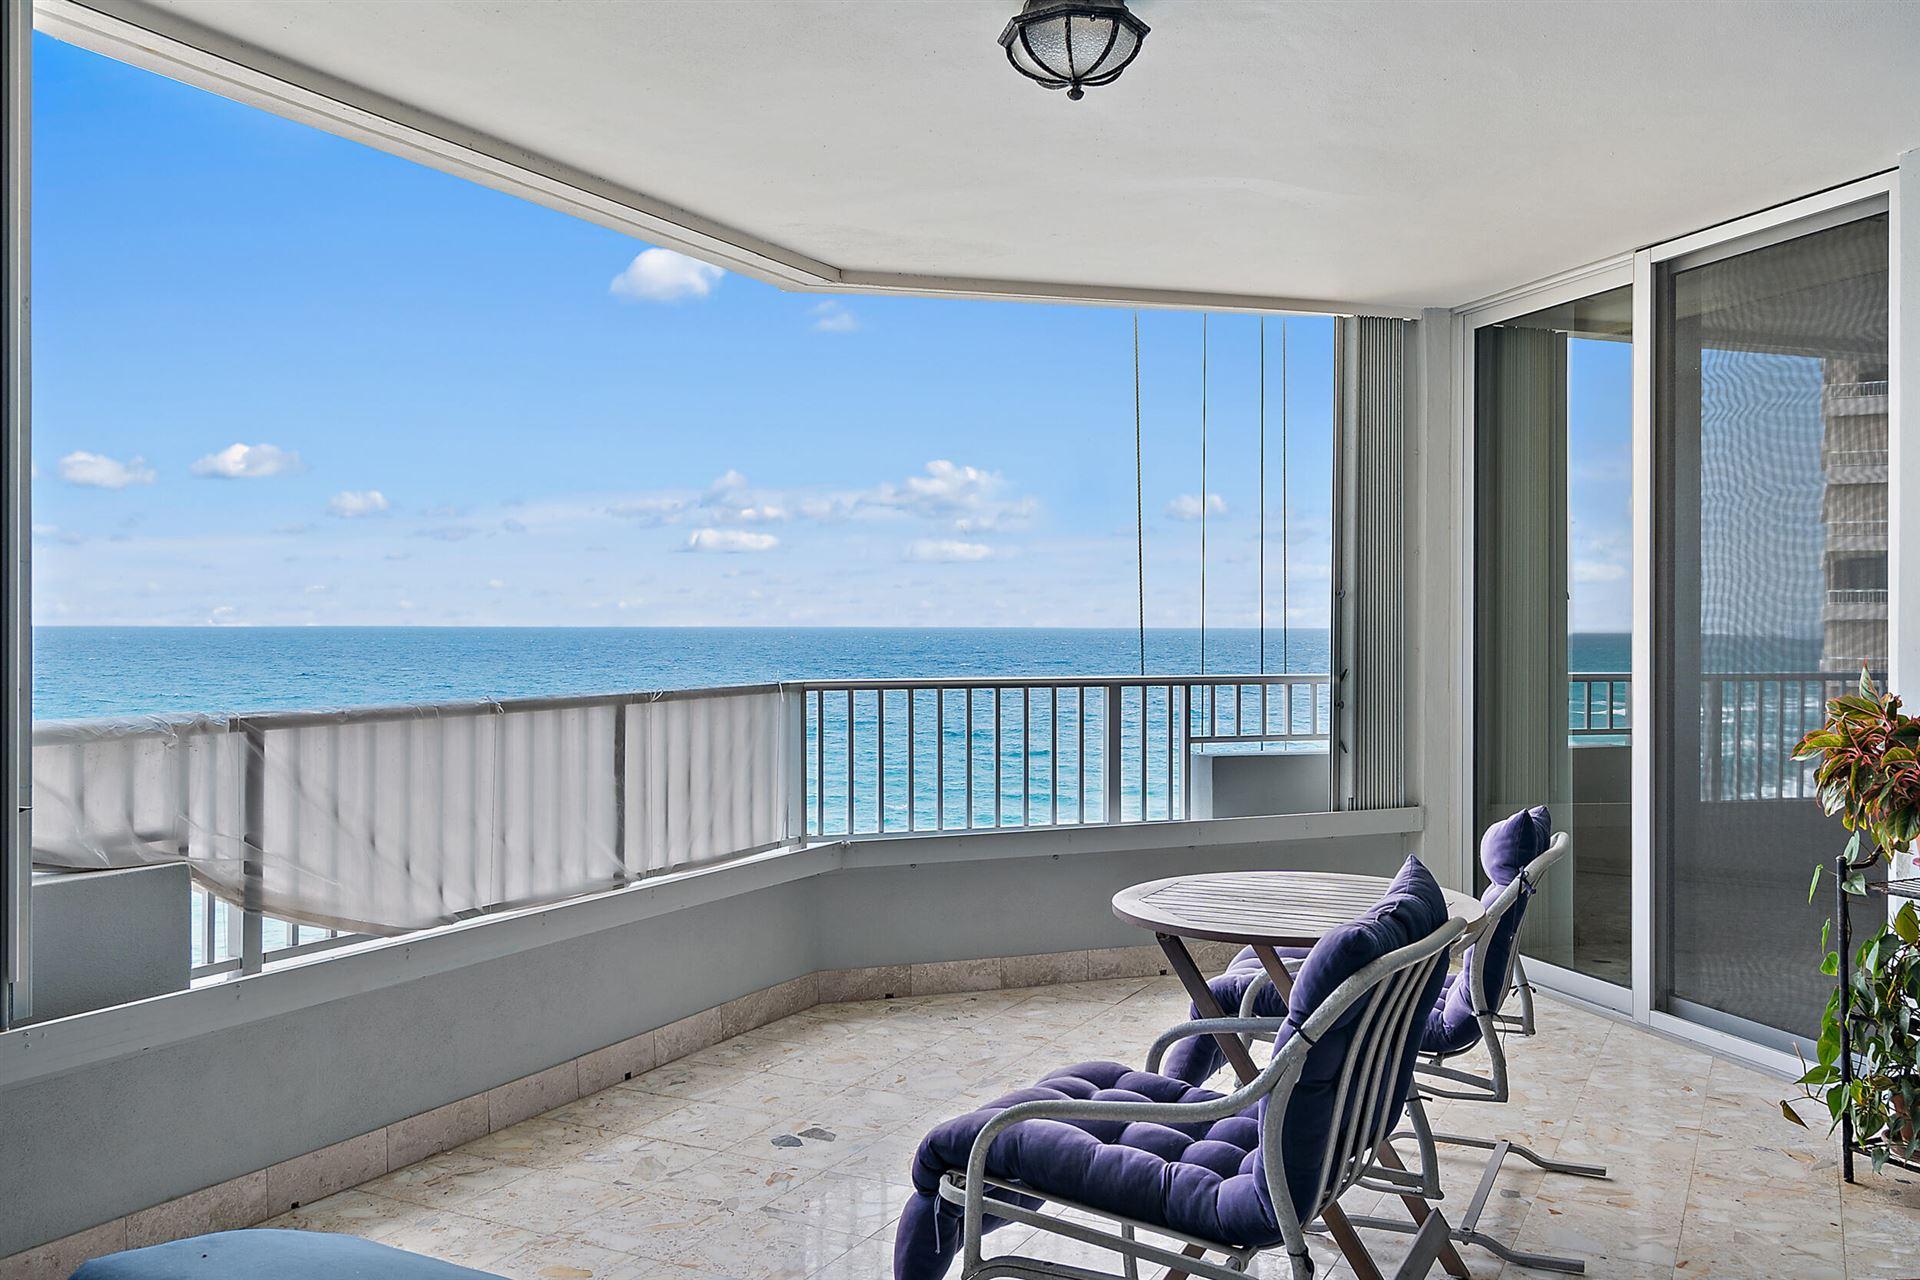 Photo for 5200 N Ocean Drive #1003, Singer Island, FL 33404 (MLS # RX-10741623)